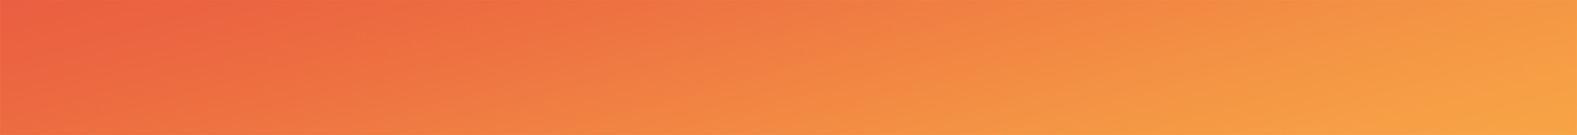 Barra_degradê_laranjas.jpg